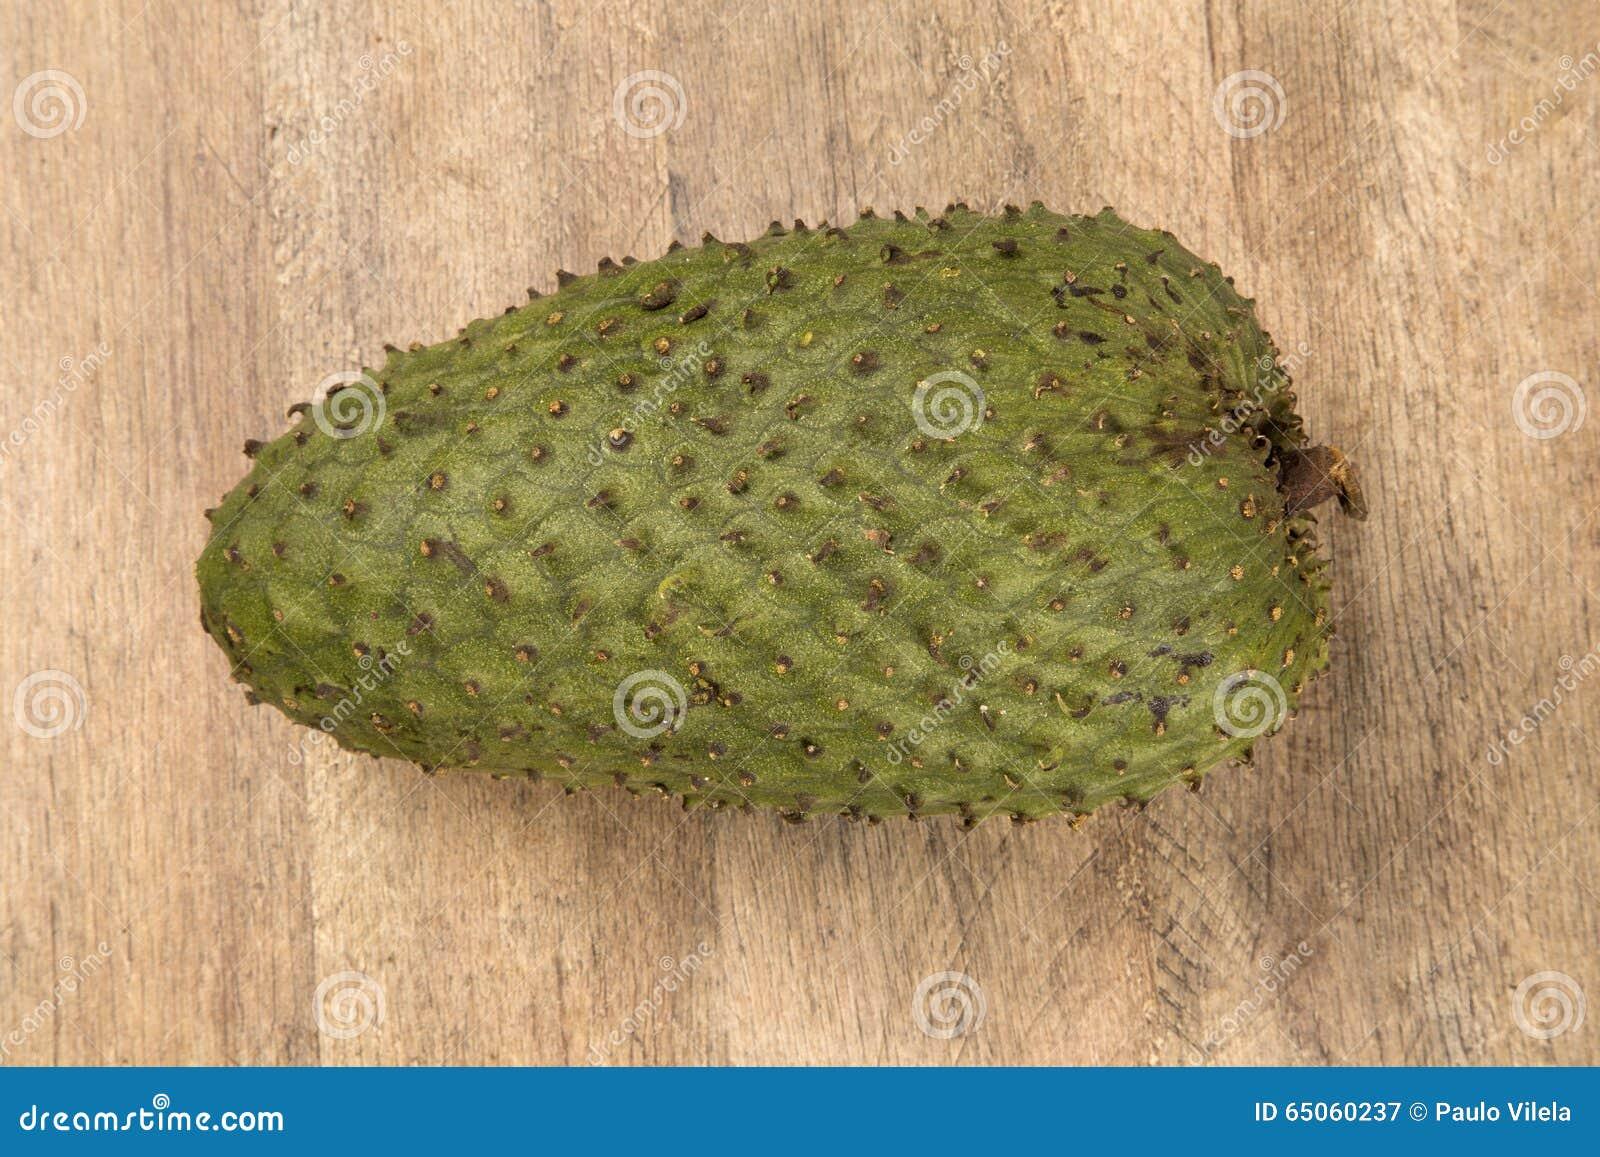 Sour Sop, Prickly Custard Apple  Stock Image - Image of vitamin